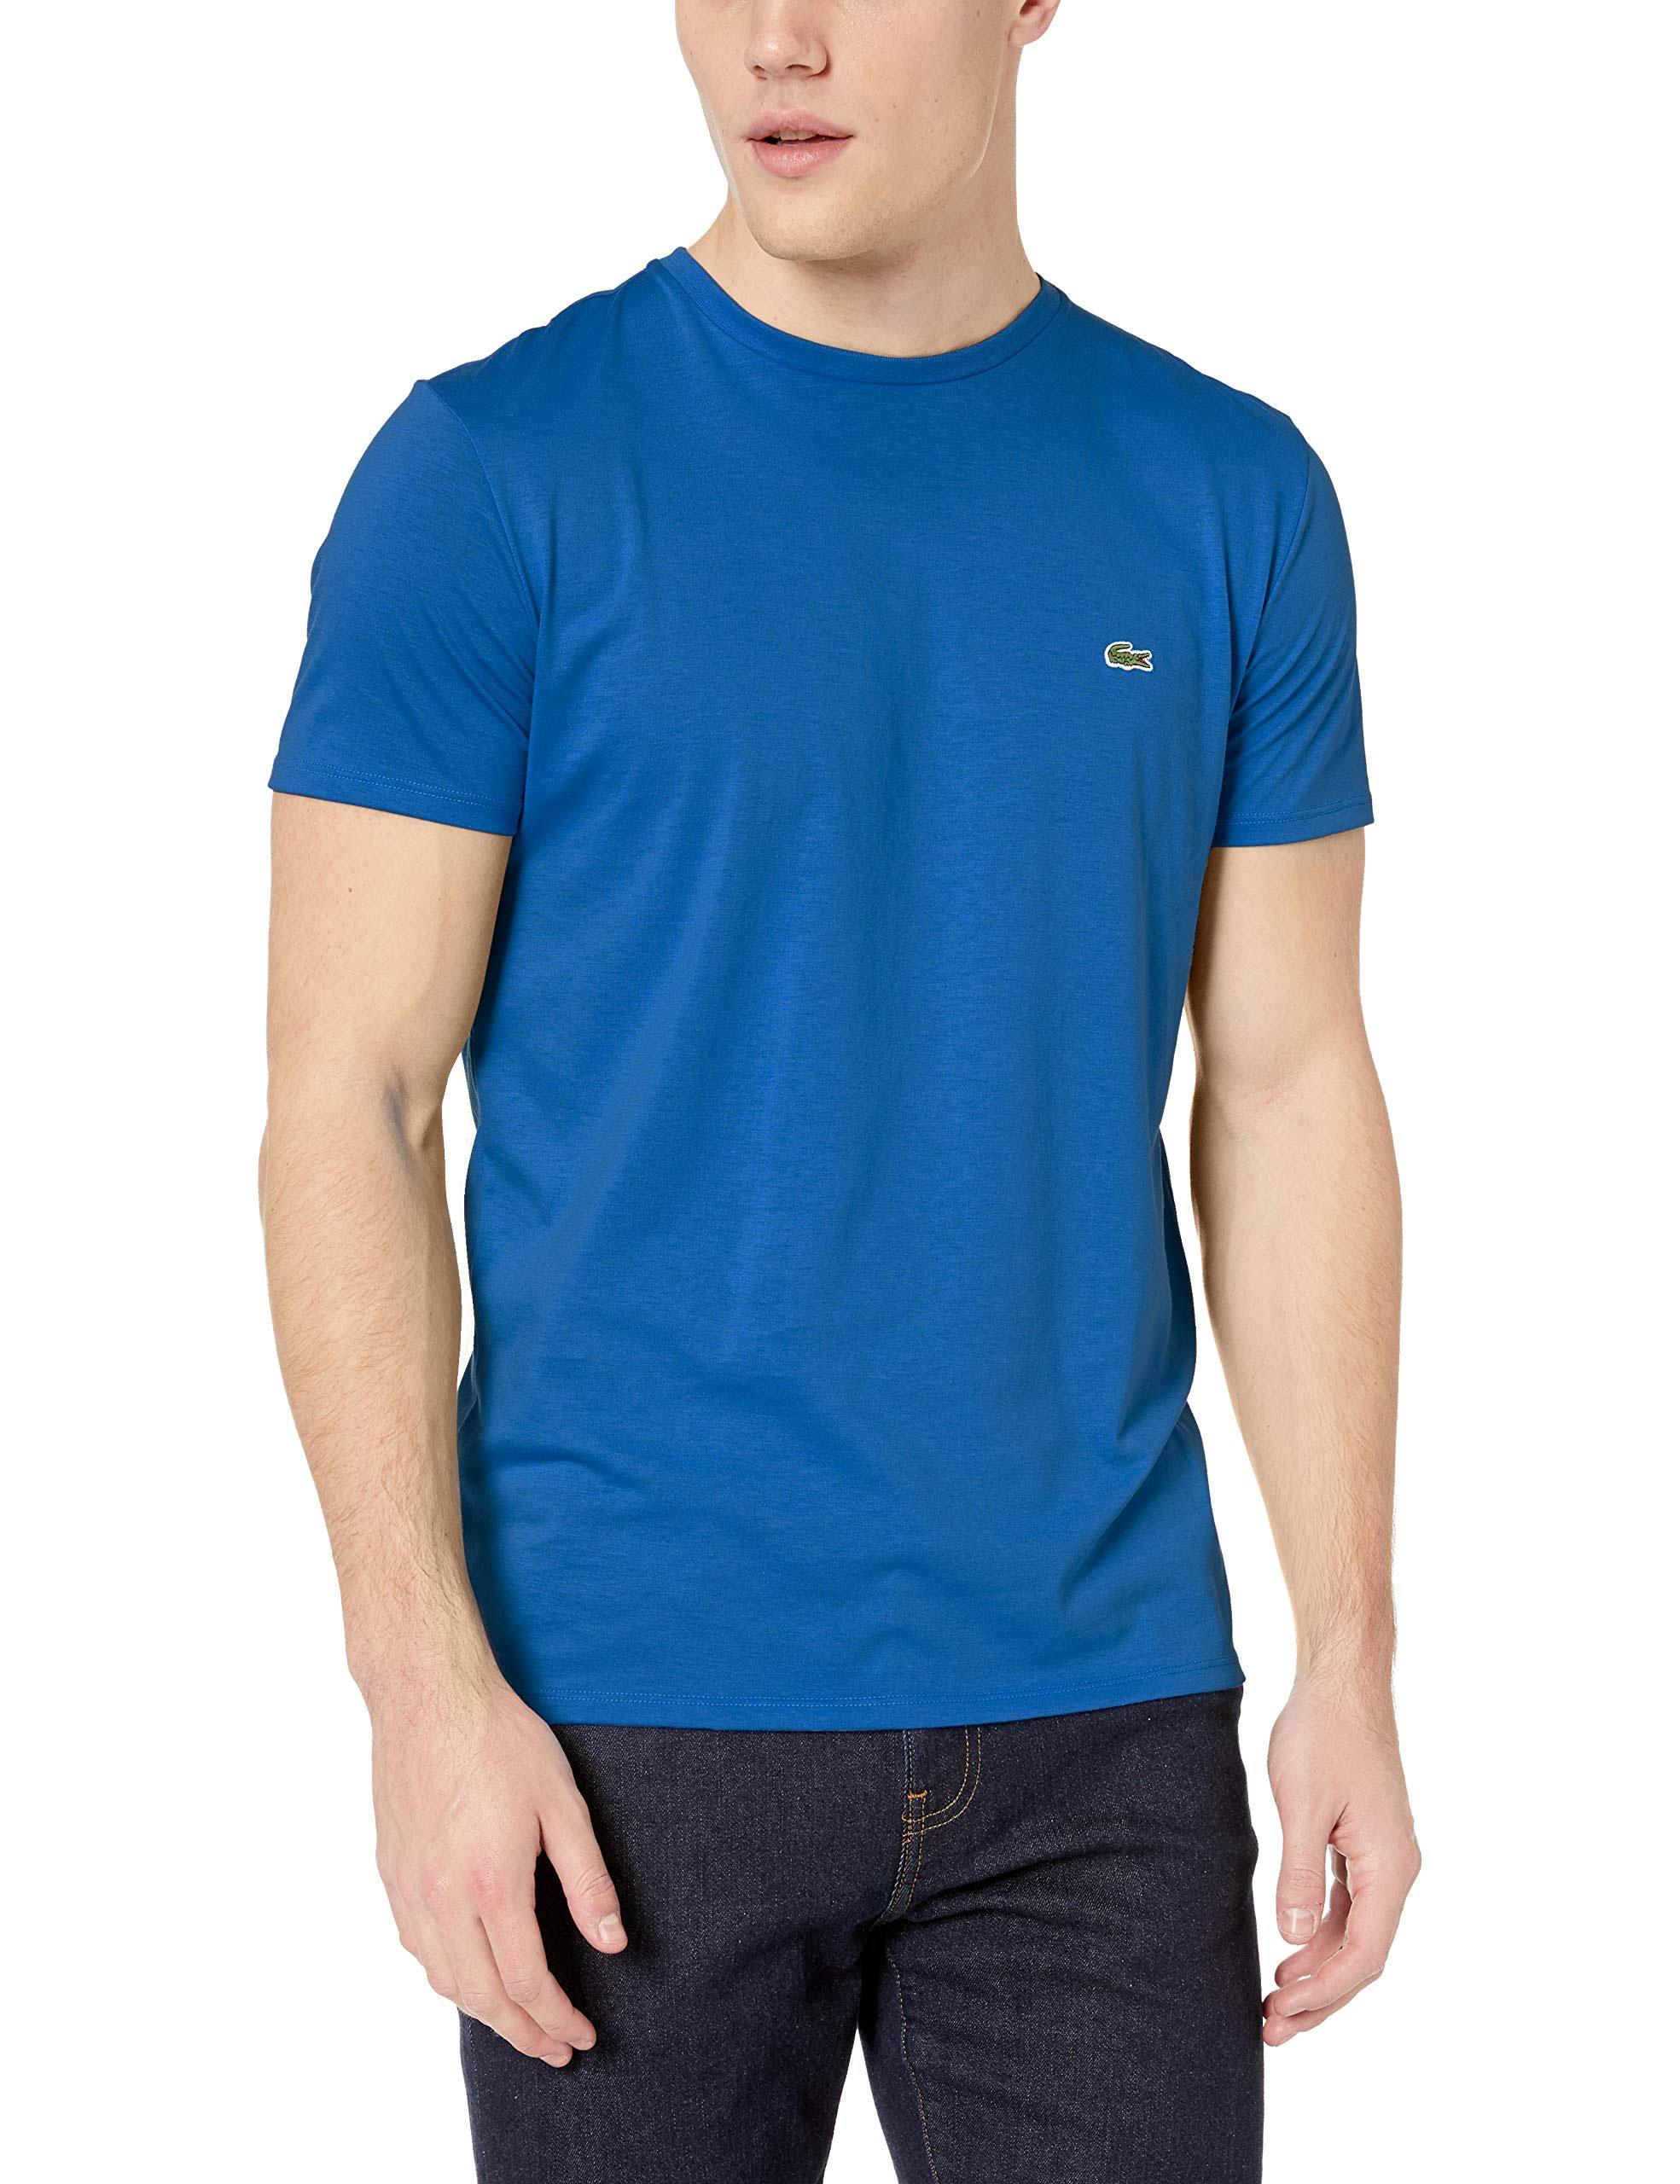 Herren Baumwolljersey Lacoste z7z shirt T Th6709 Pima Stil Iawxqw4OC